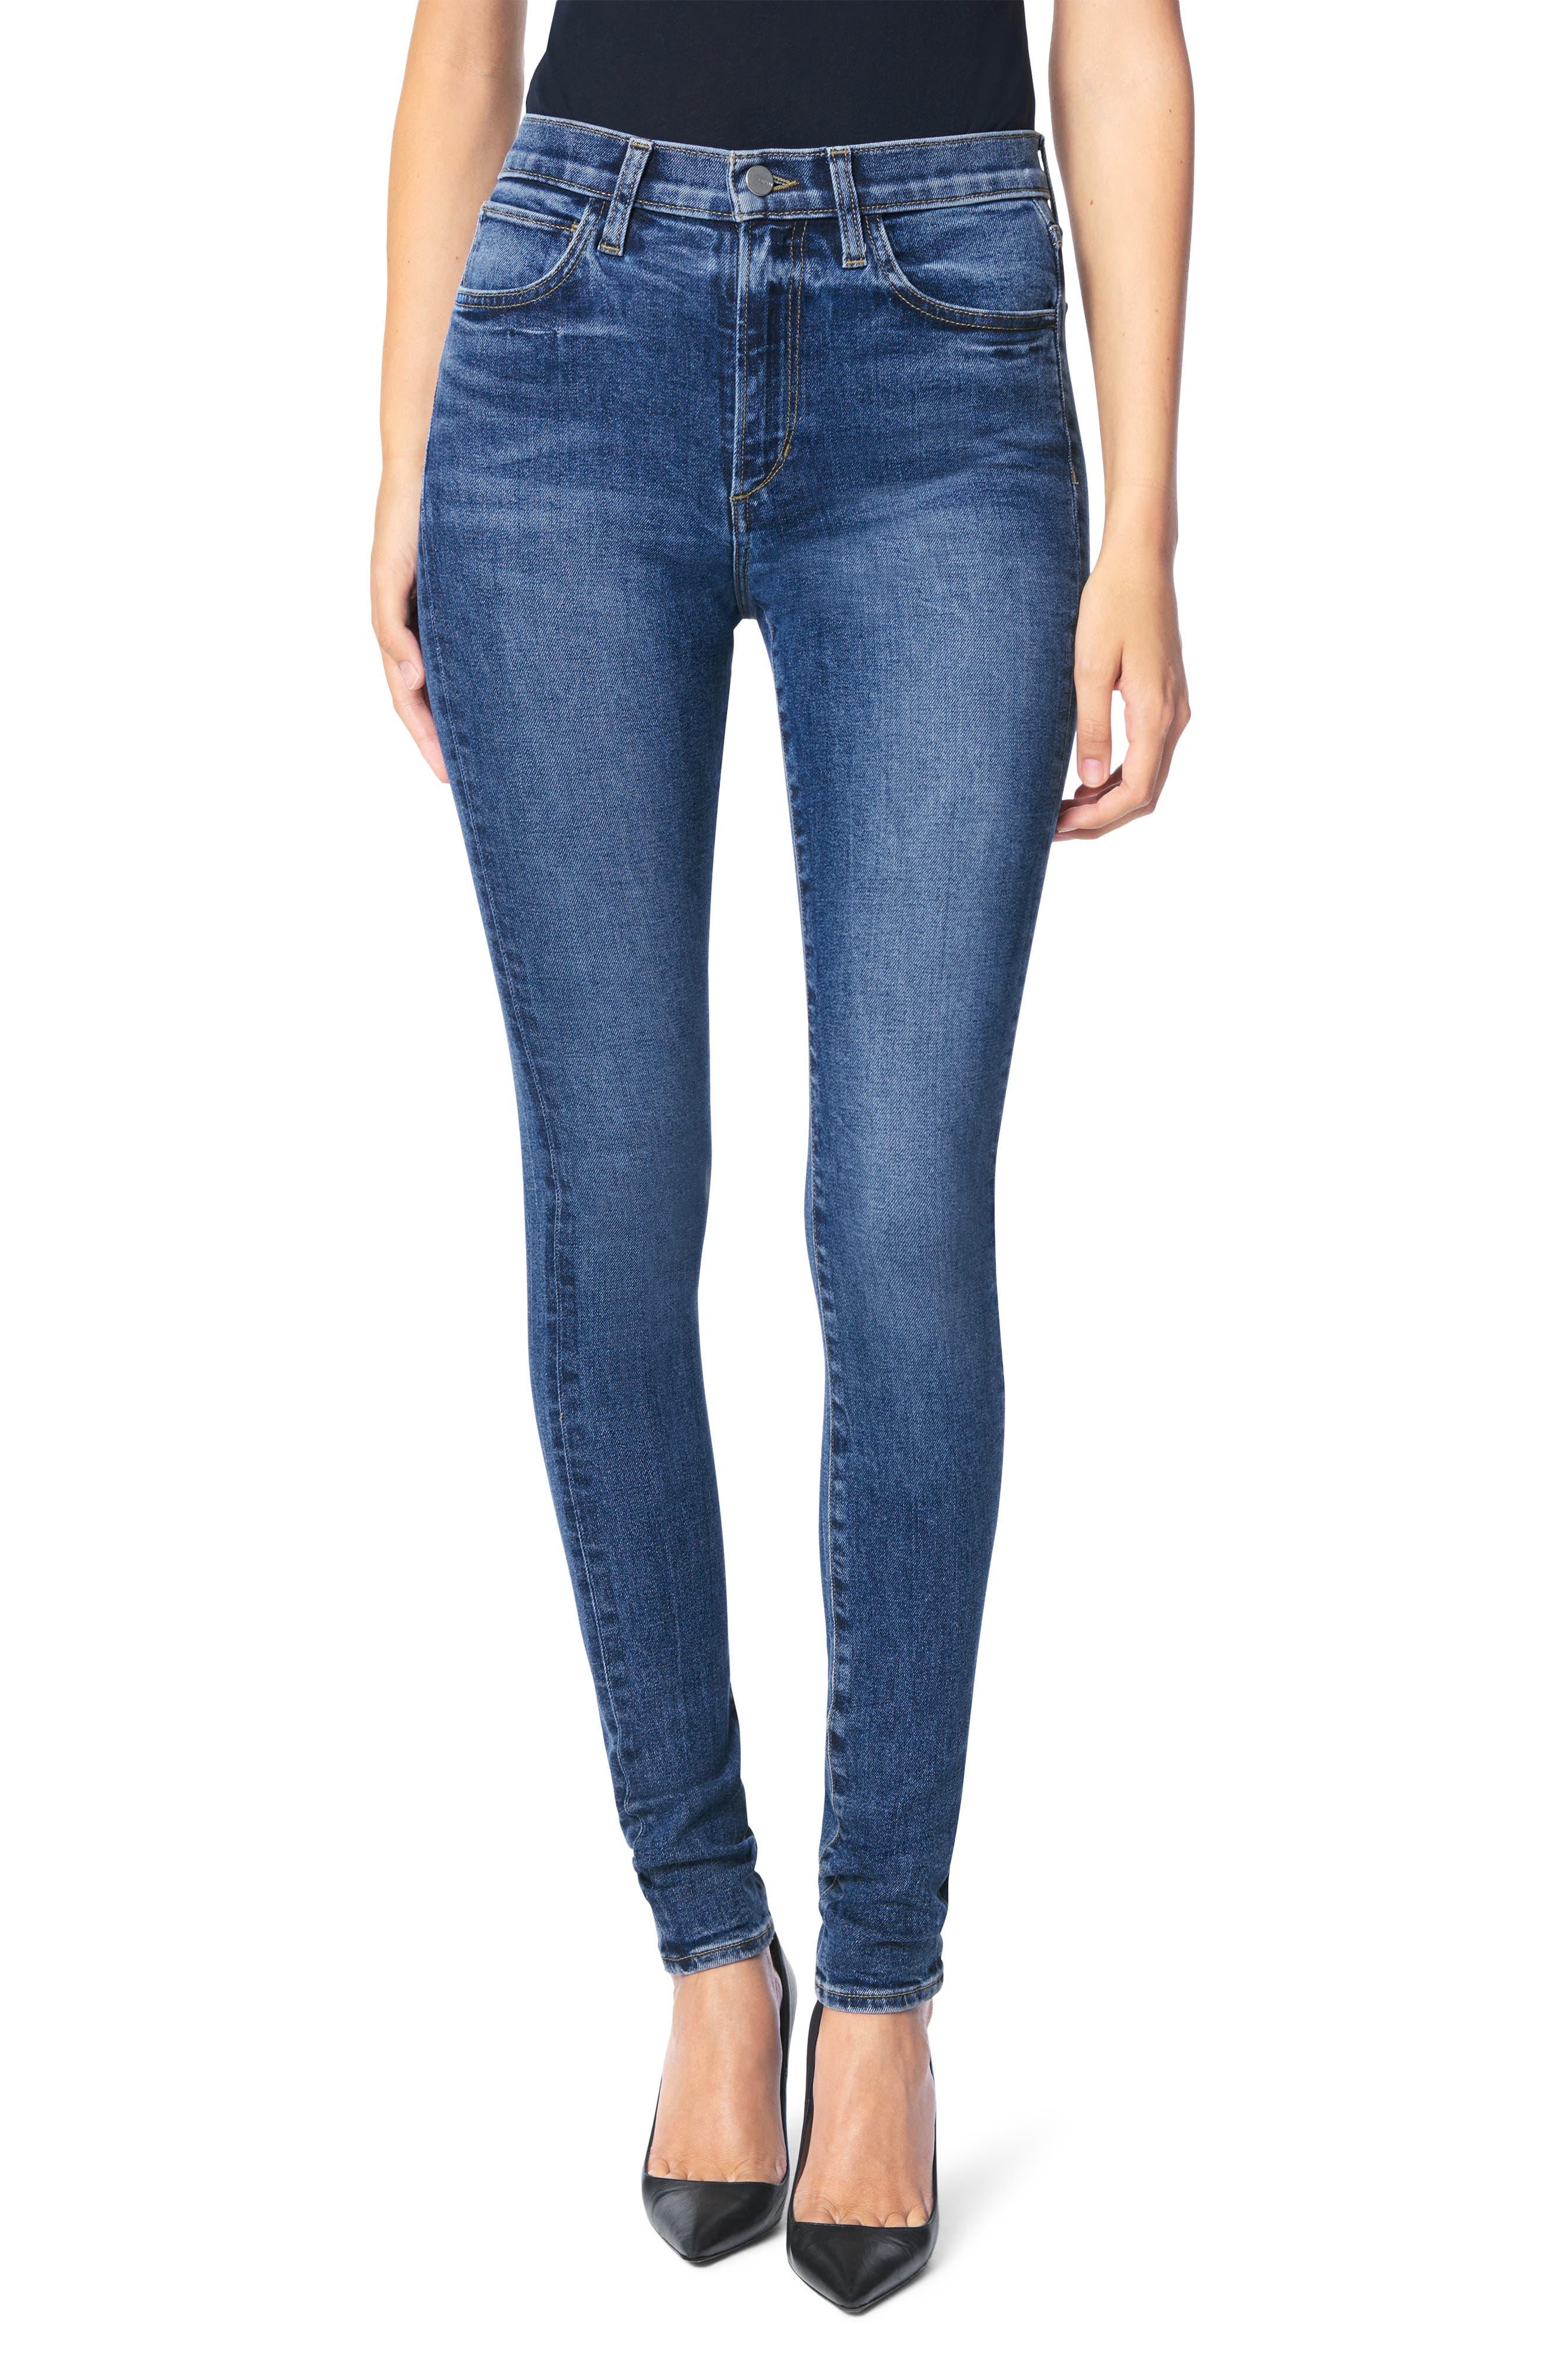 Twiggy High Waist Long Skinny Jeans